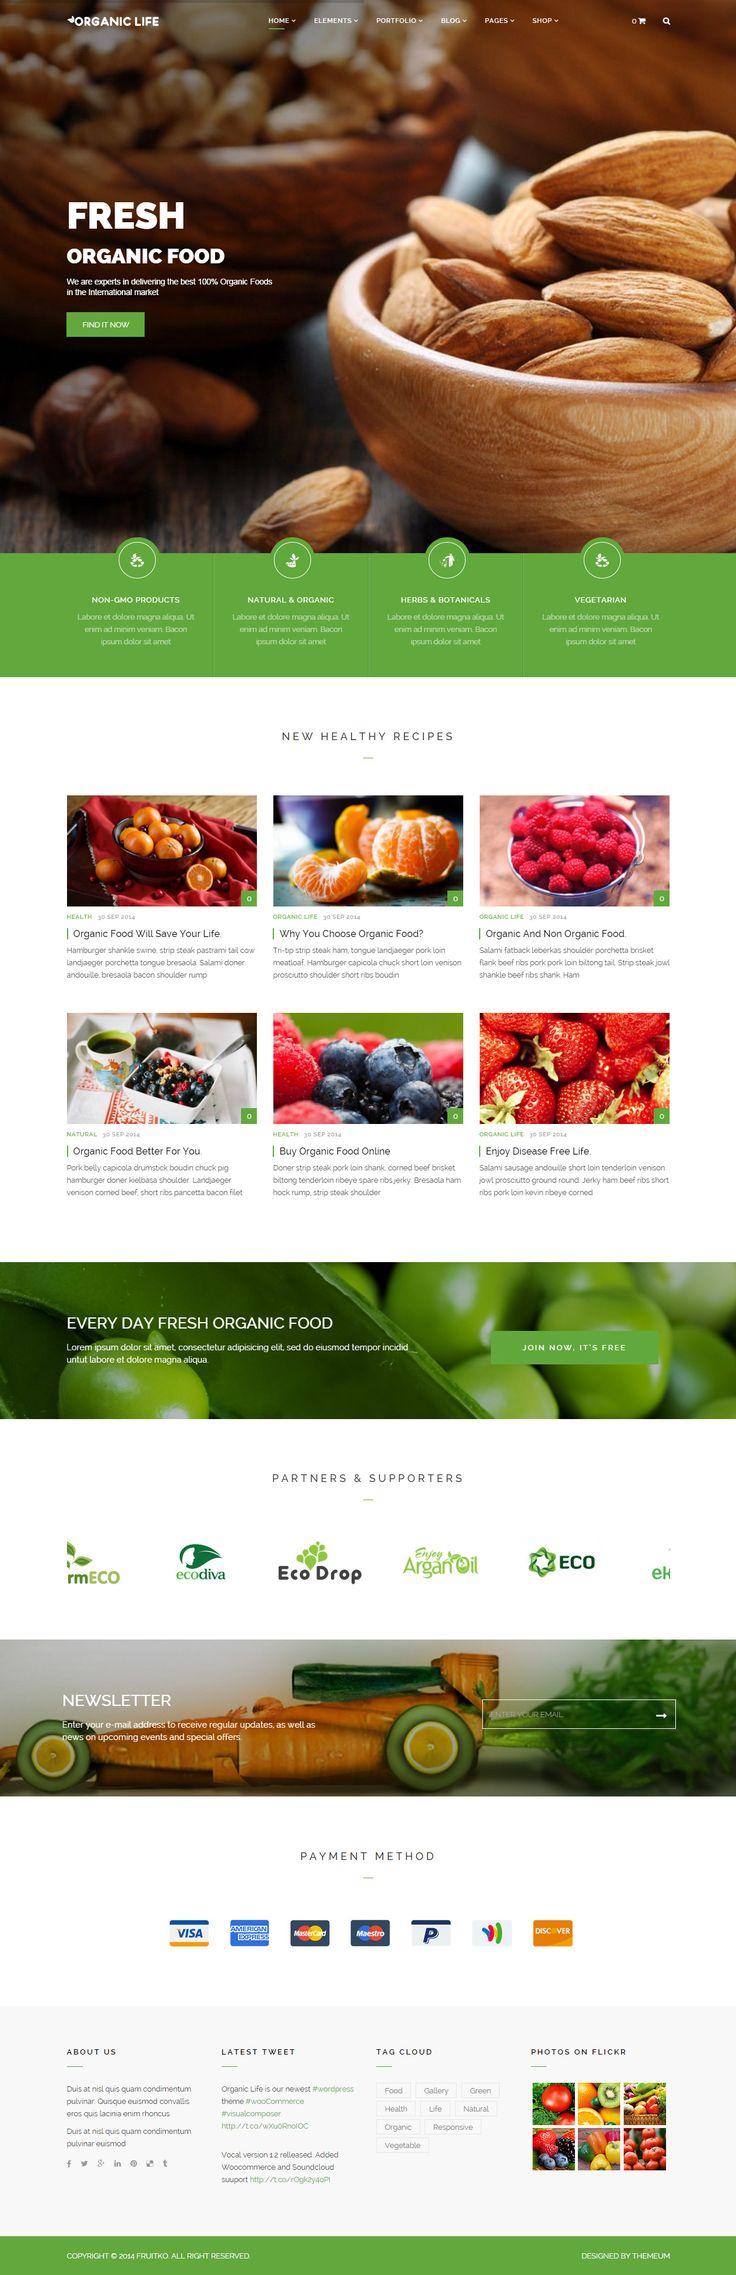 Oragnic Life is Premium Responsive Parallax WordPress Food theme. WooCommerce. Bootstrap. Visual Composer. Revolution Slider. http://www.responsivemiracle.com/cms/organic-life-premium-responsive-ecology-environmental-wordpress-theme/